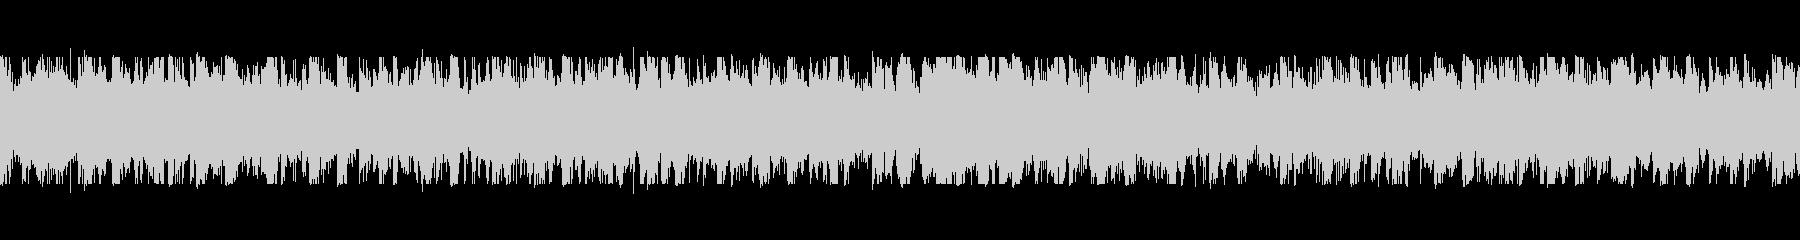 bpm131ピアノ主体ループアンビエントの未再生の波形